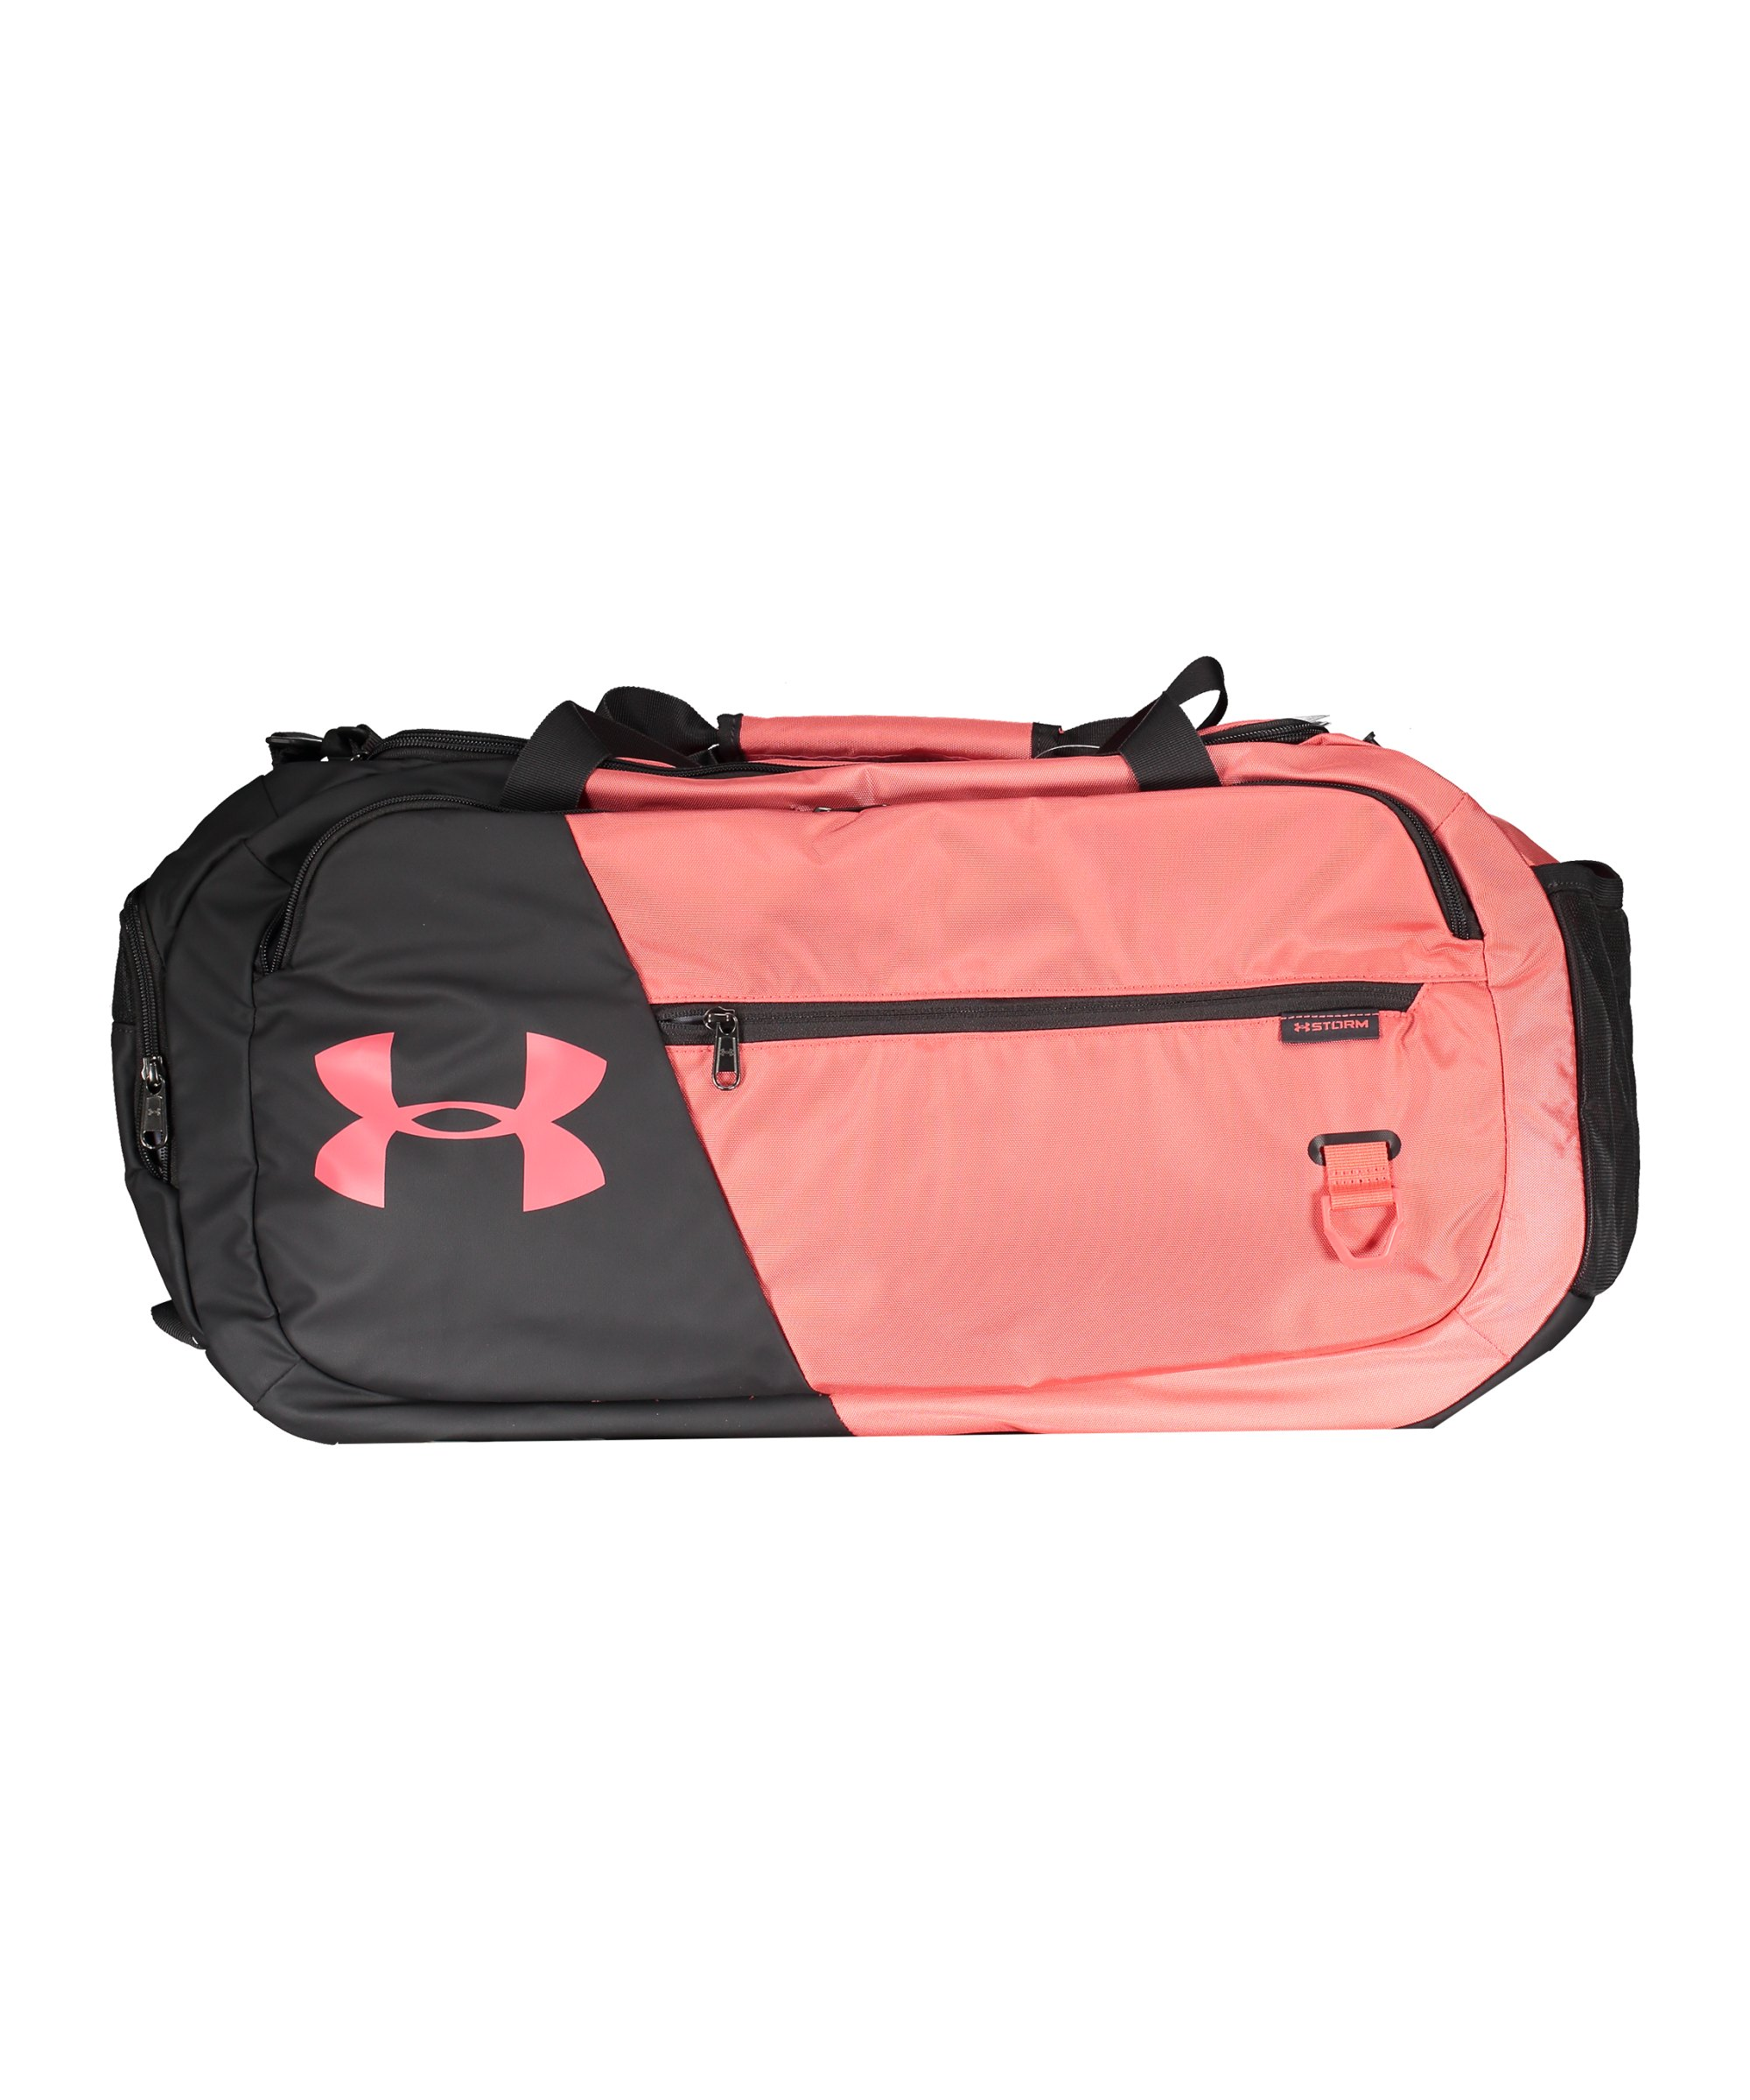 Under Armour Duffle 4.0 Sporttasche M Pink F677 - pink